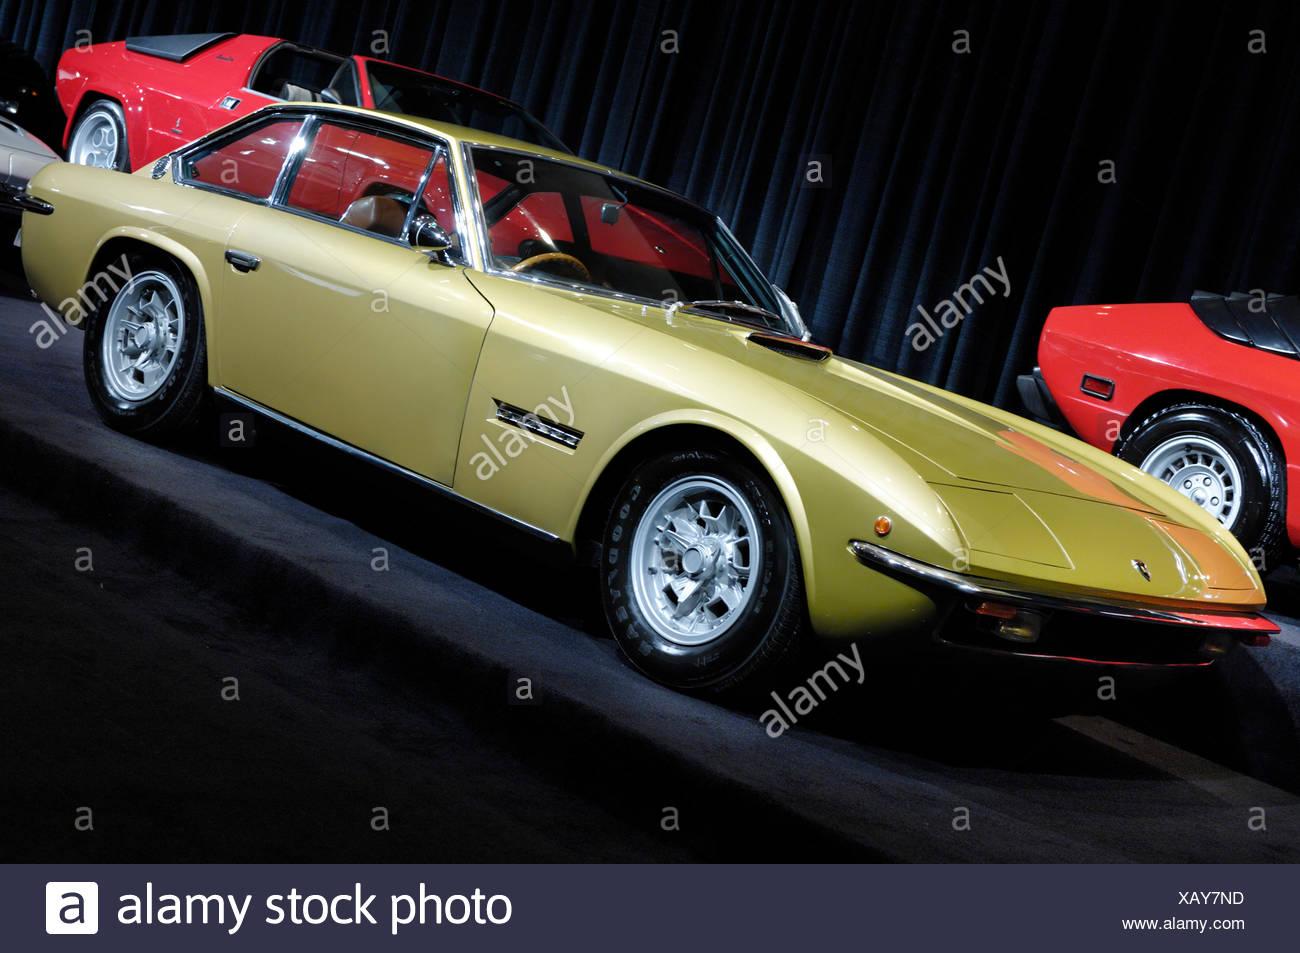 Toronto Car Show Stock Photos & Toronto Car Show Stock Images - Alamy